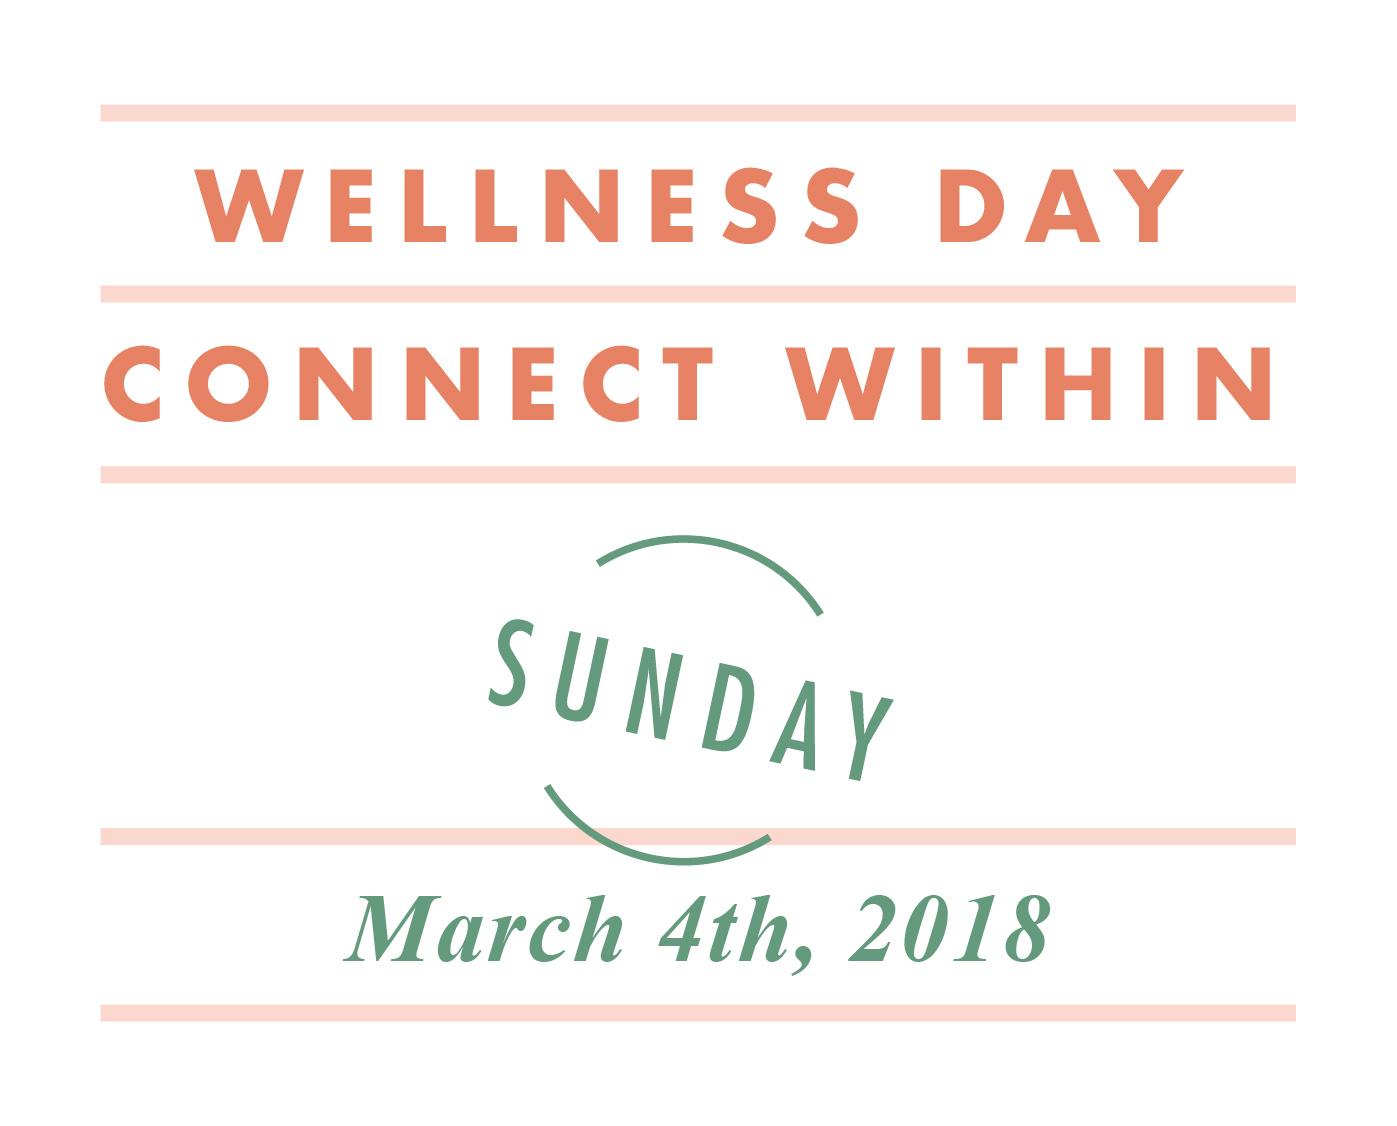 WAG-Summit-2018-wellness-day_wellness-day.jpg